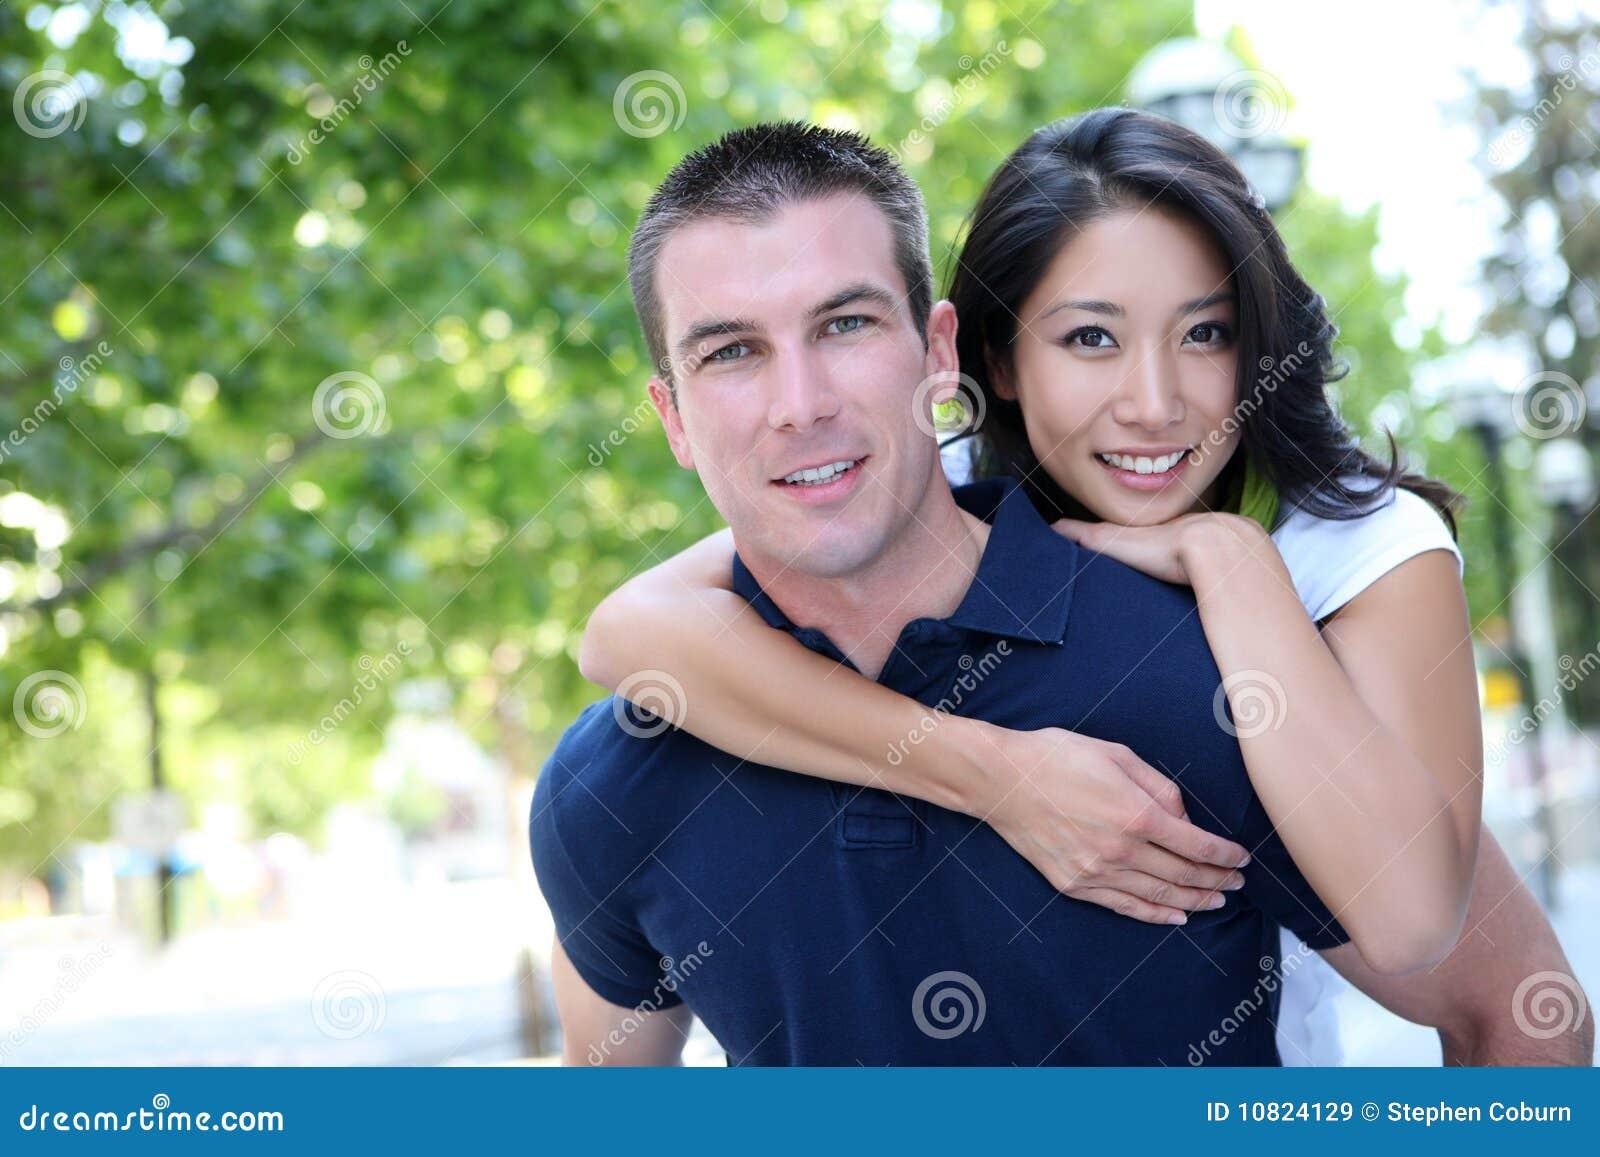 Free interracial dating website